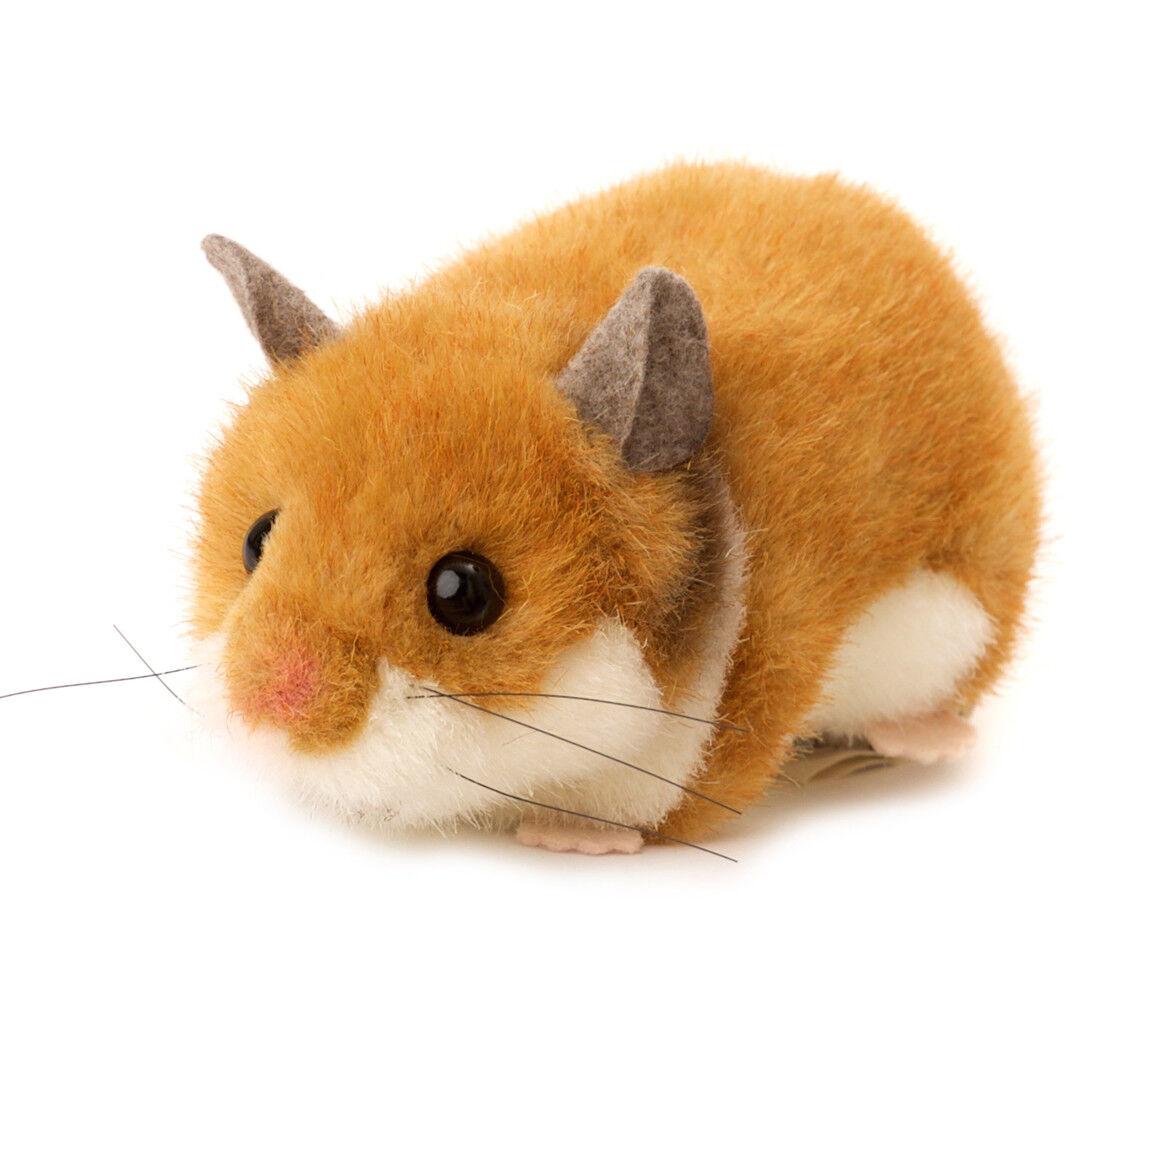 Hamster - exquisite plush collectors cuddly soft toy - Kosen   Kösen - 3390